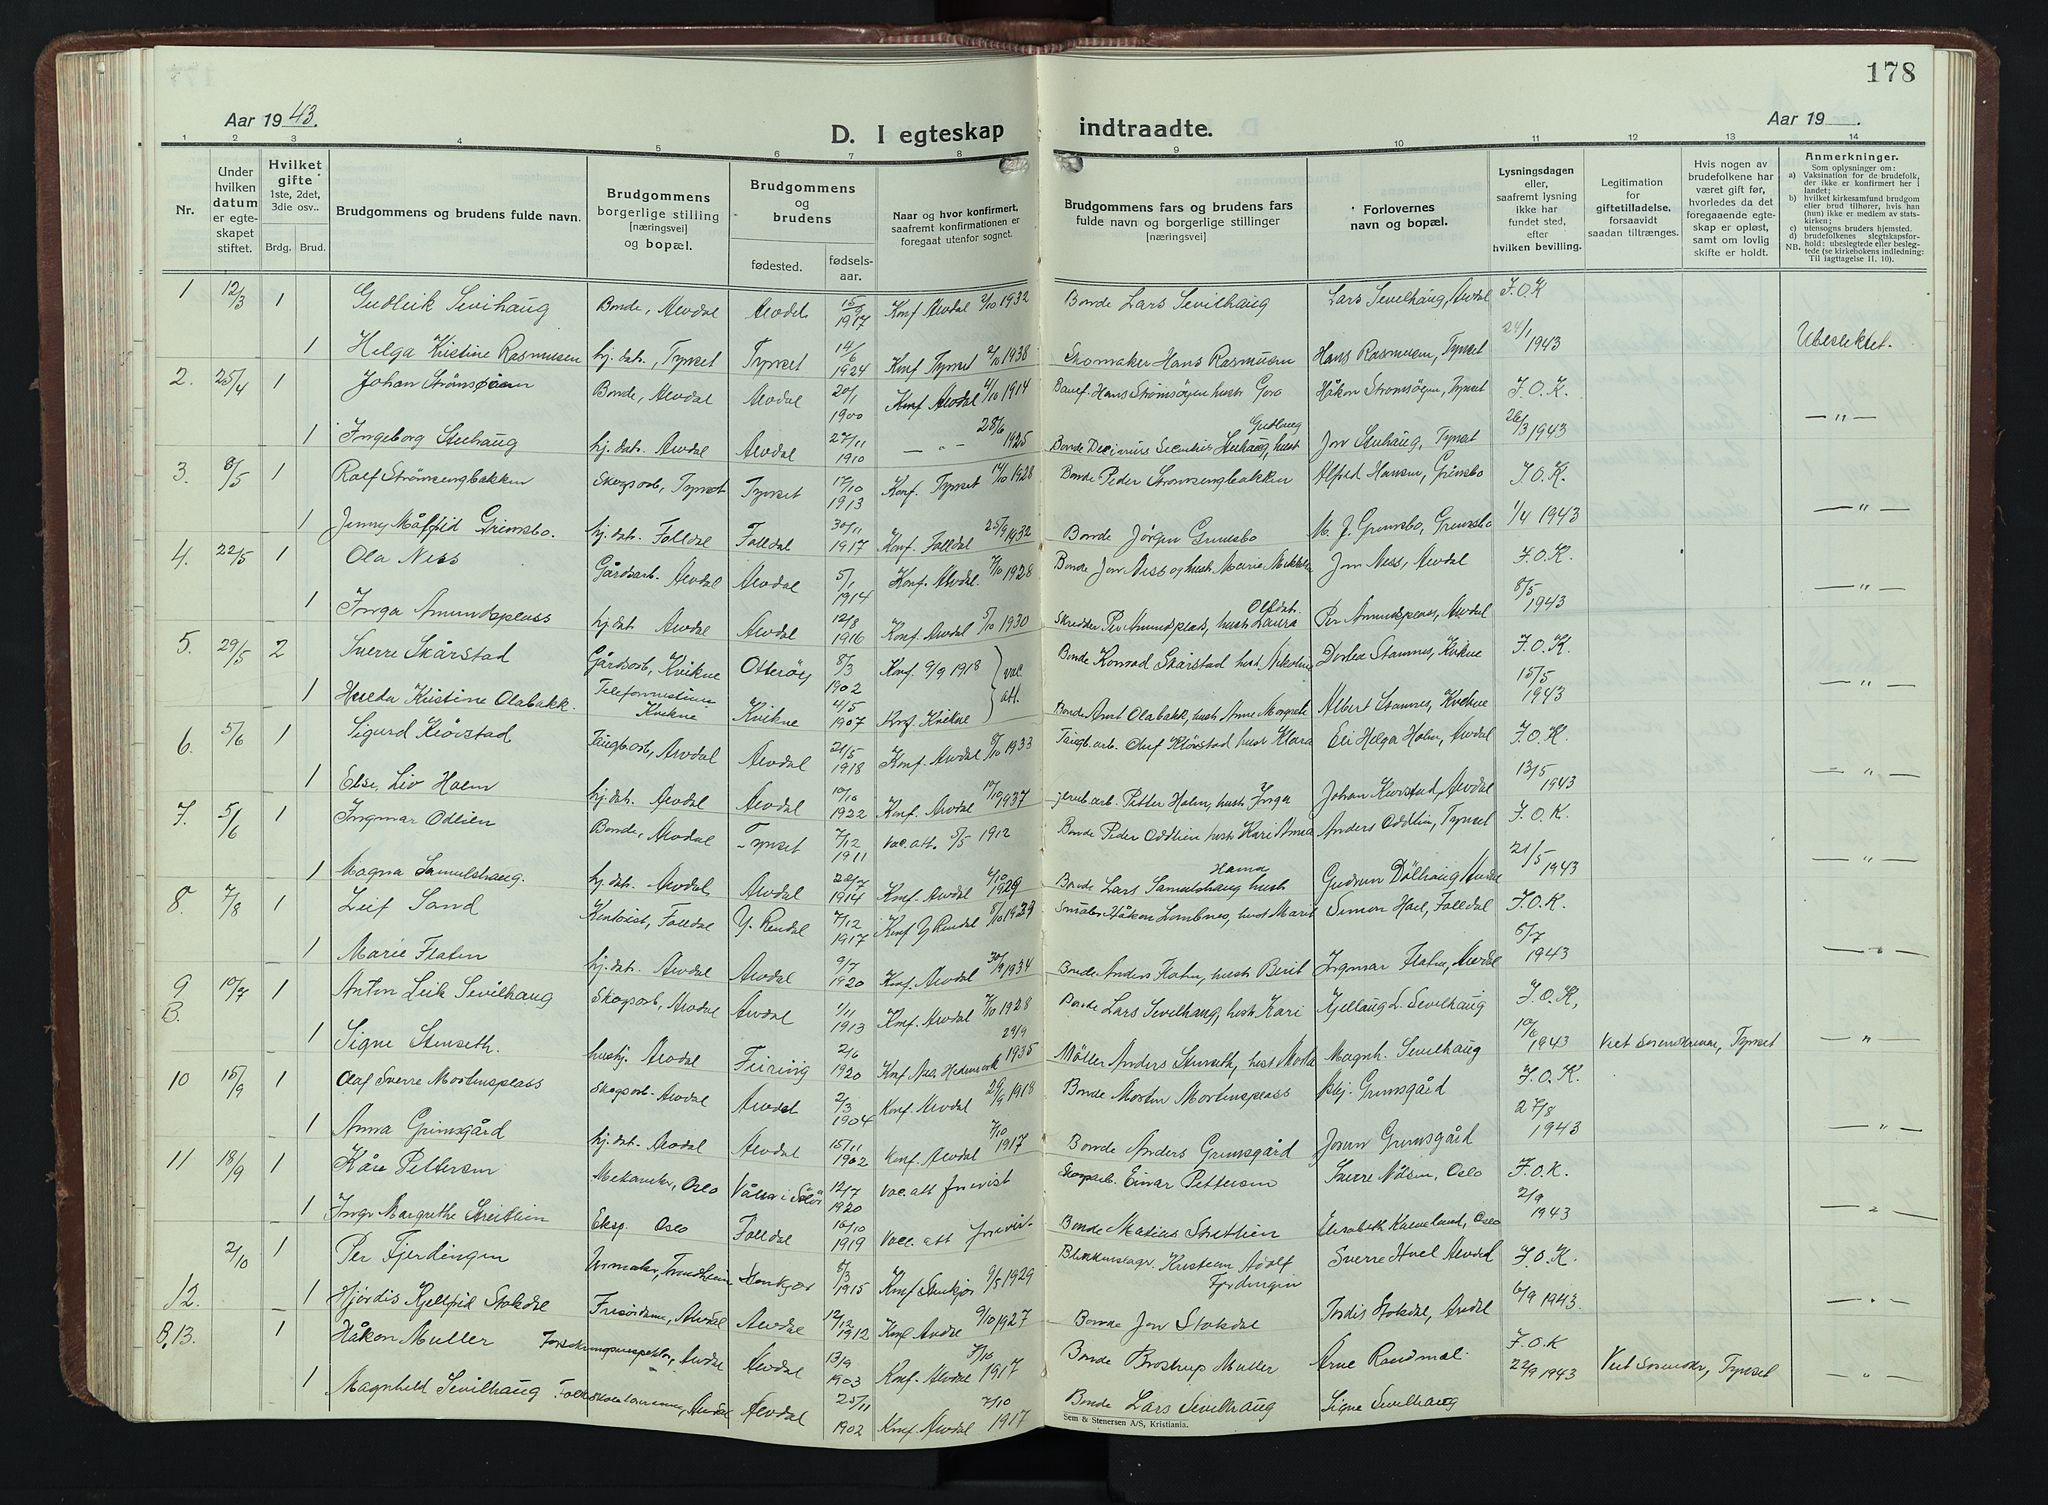 SAH, Alvdal prestekontor, Klokkerbok nr. 7, 1924-1945, s. 178